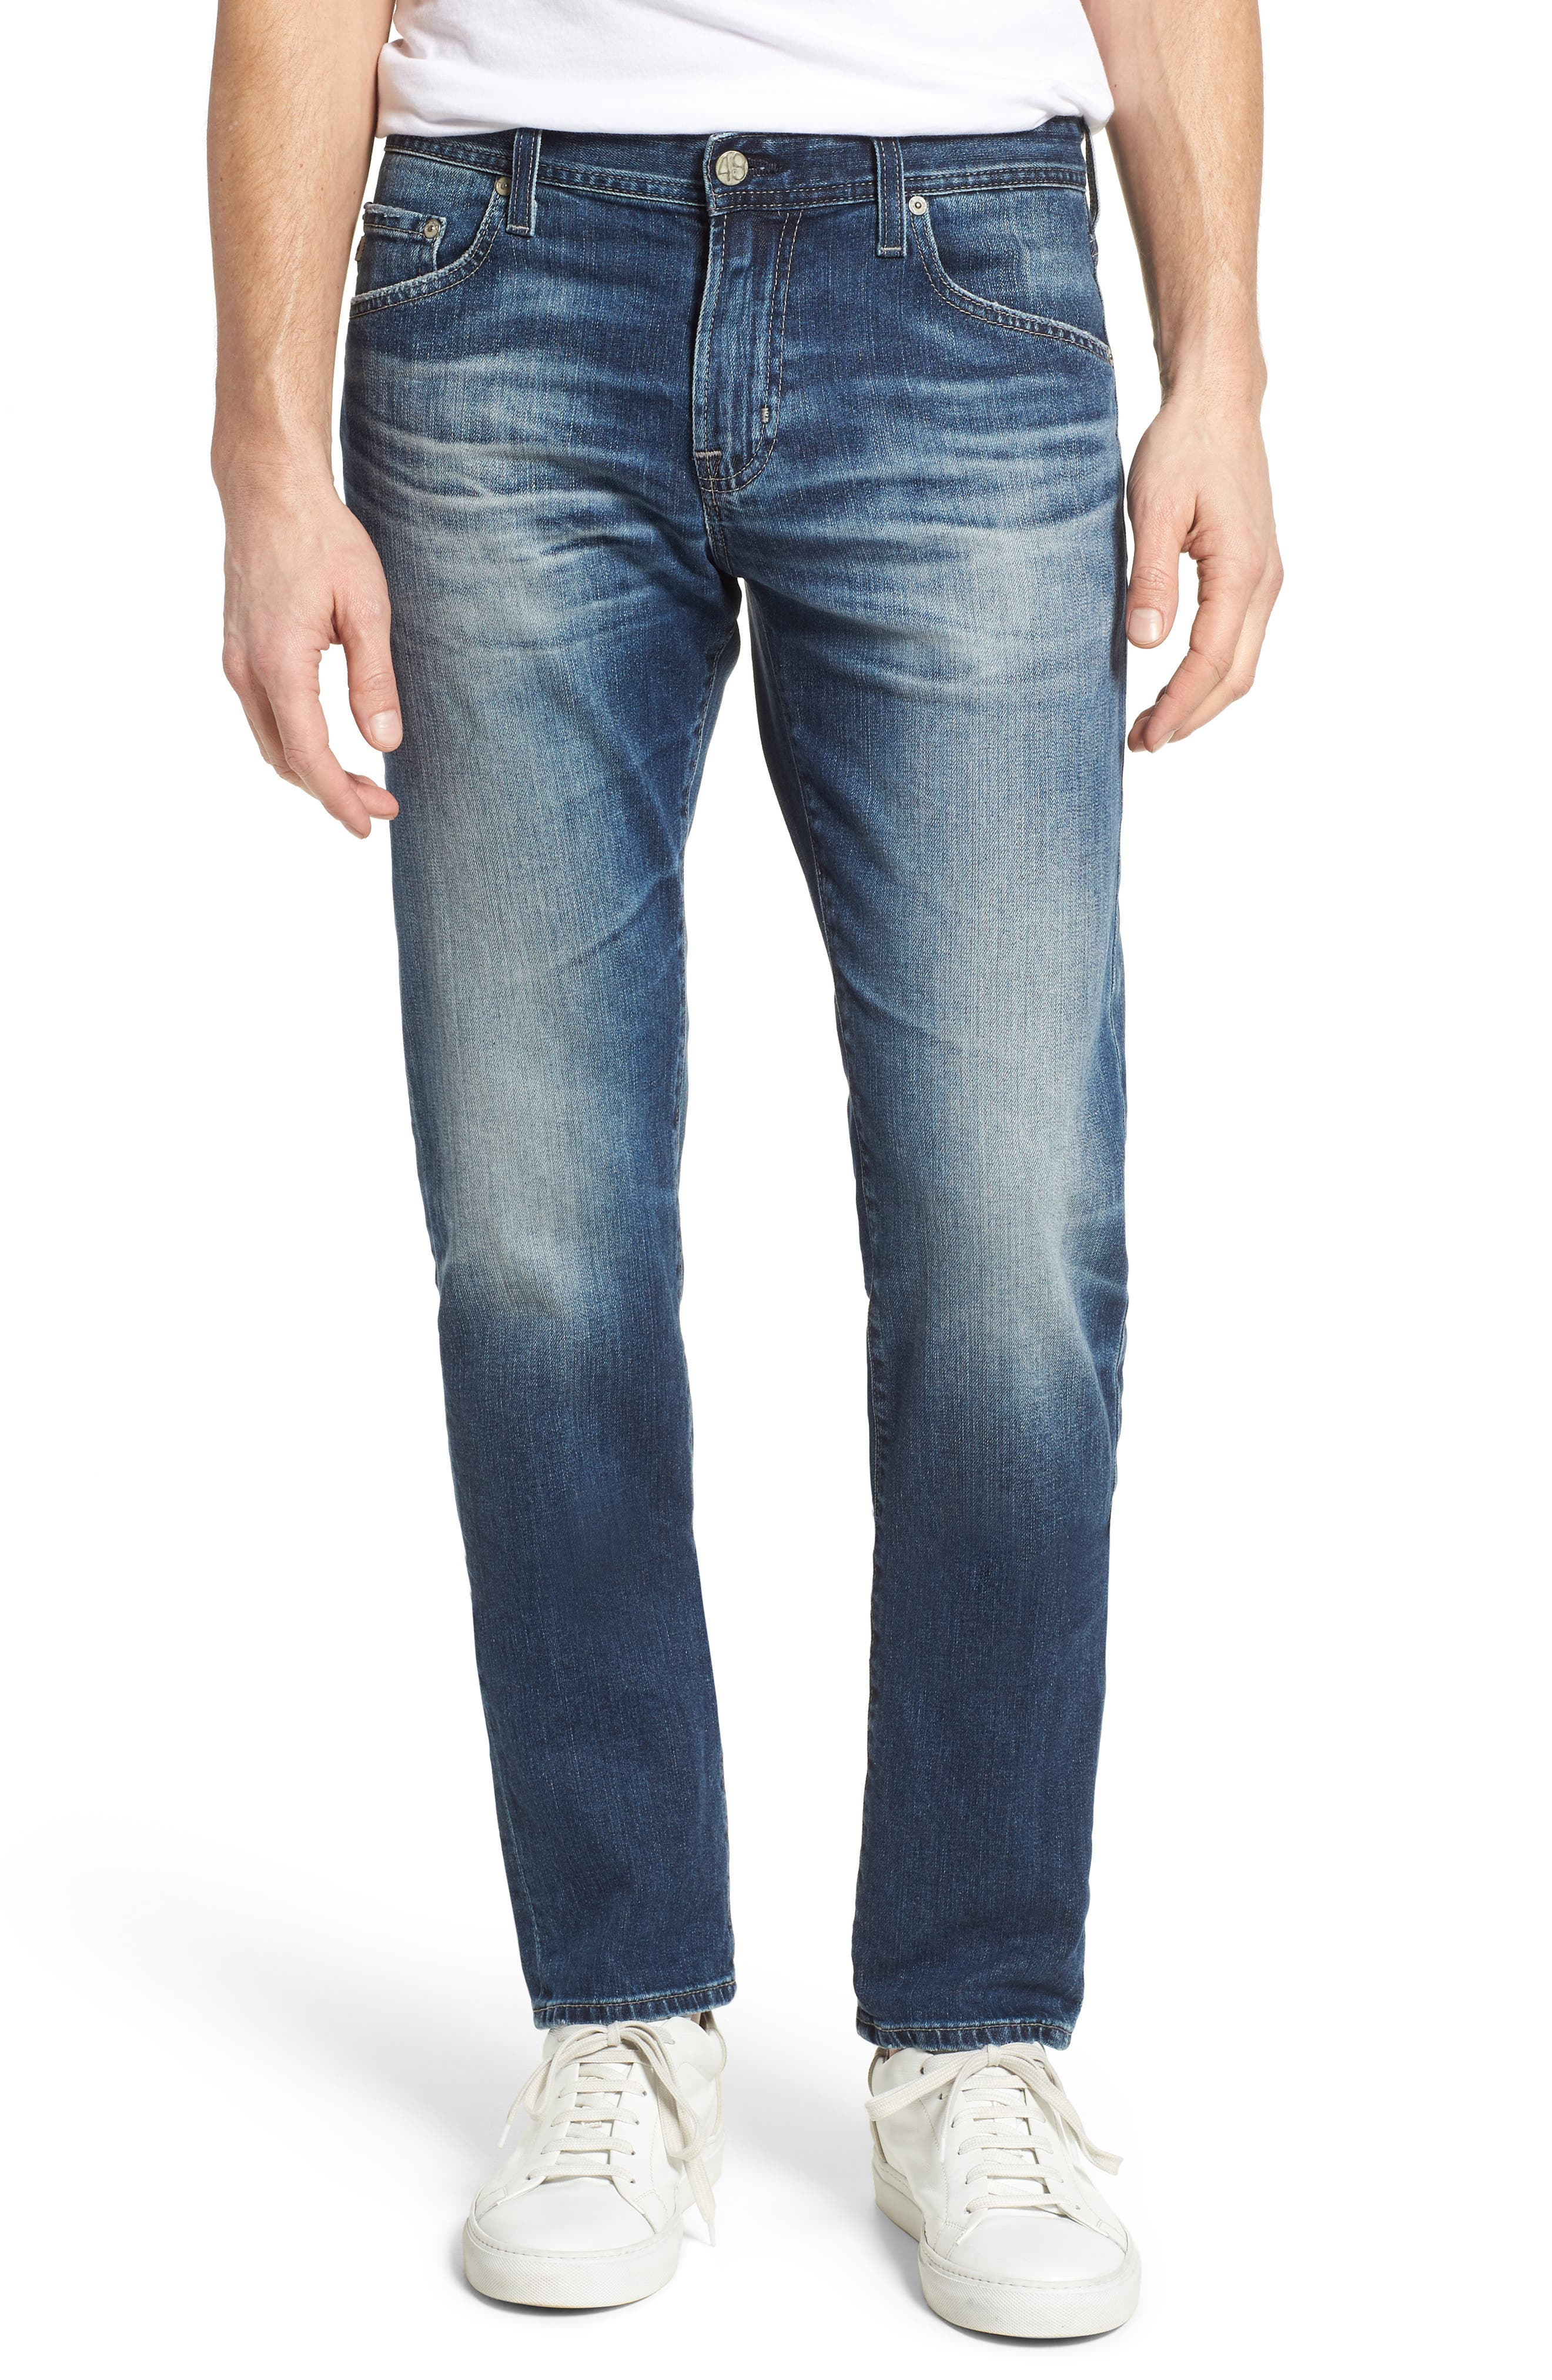 Tellis Slim Fit Jeans,                             Main thumbnail 1, color,                             12 Years Mavericks